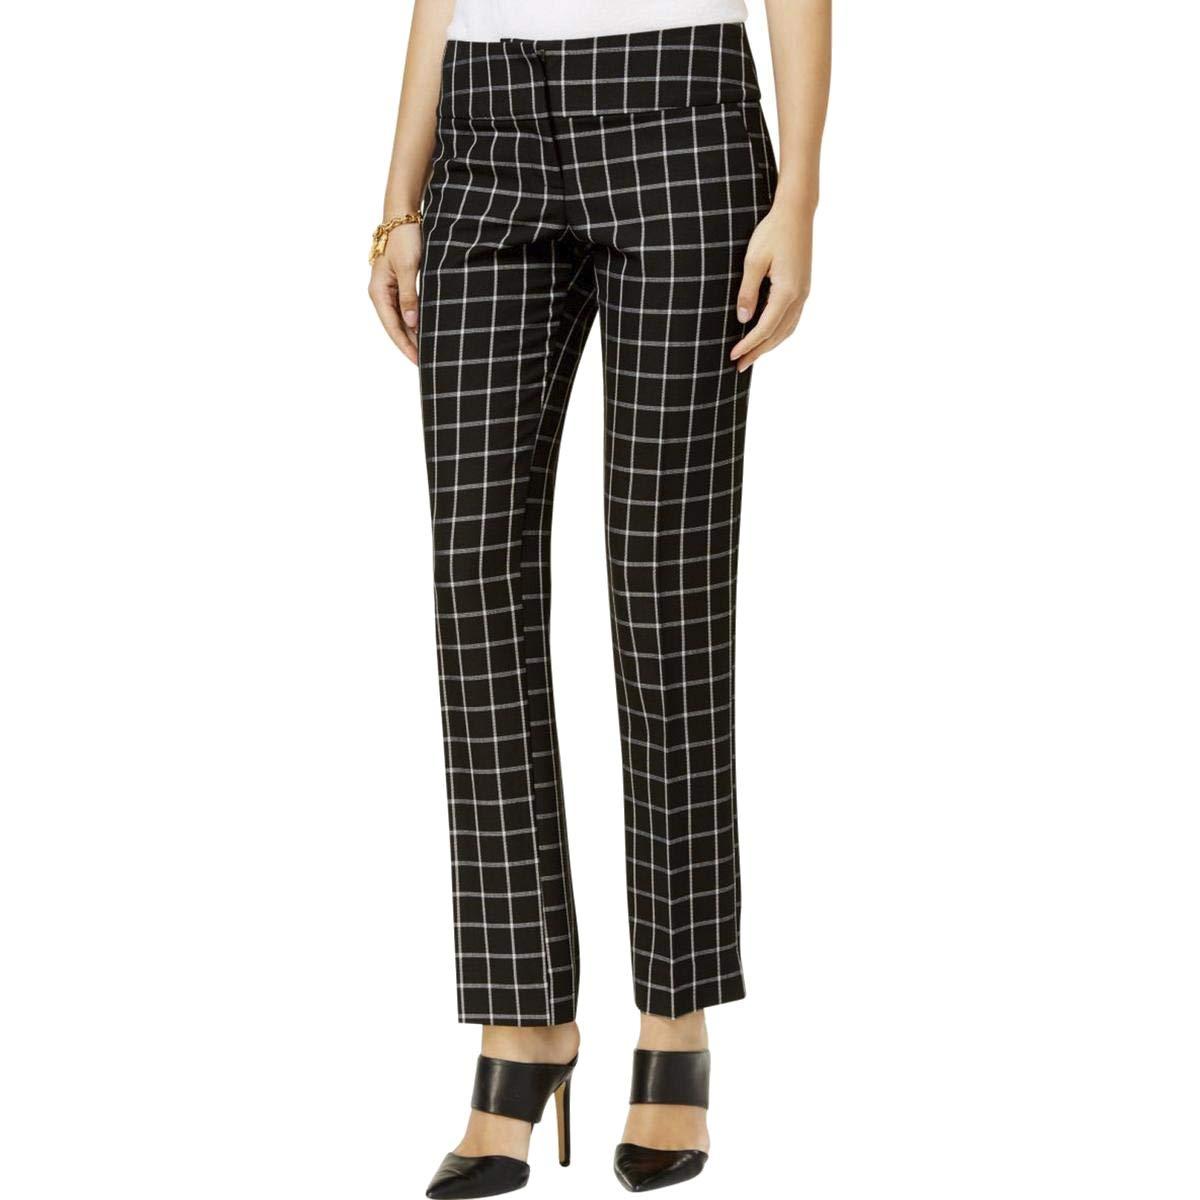 BCX Deep White Women's Stretch Plaid Printed Pants Black 9